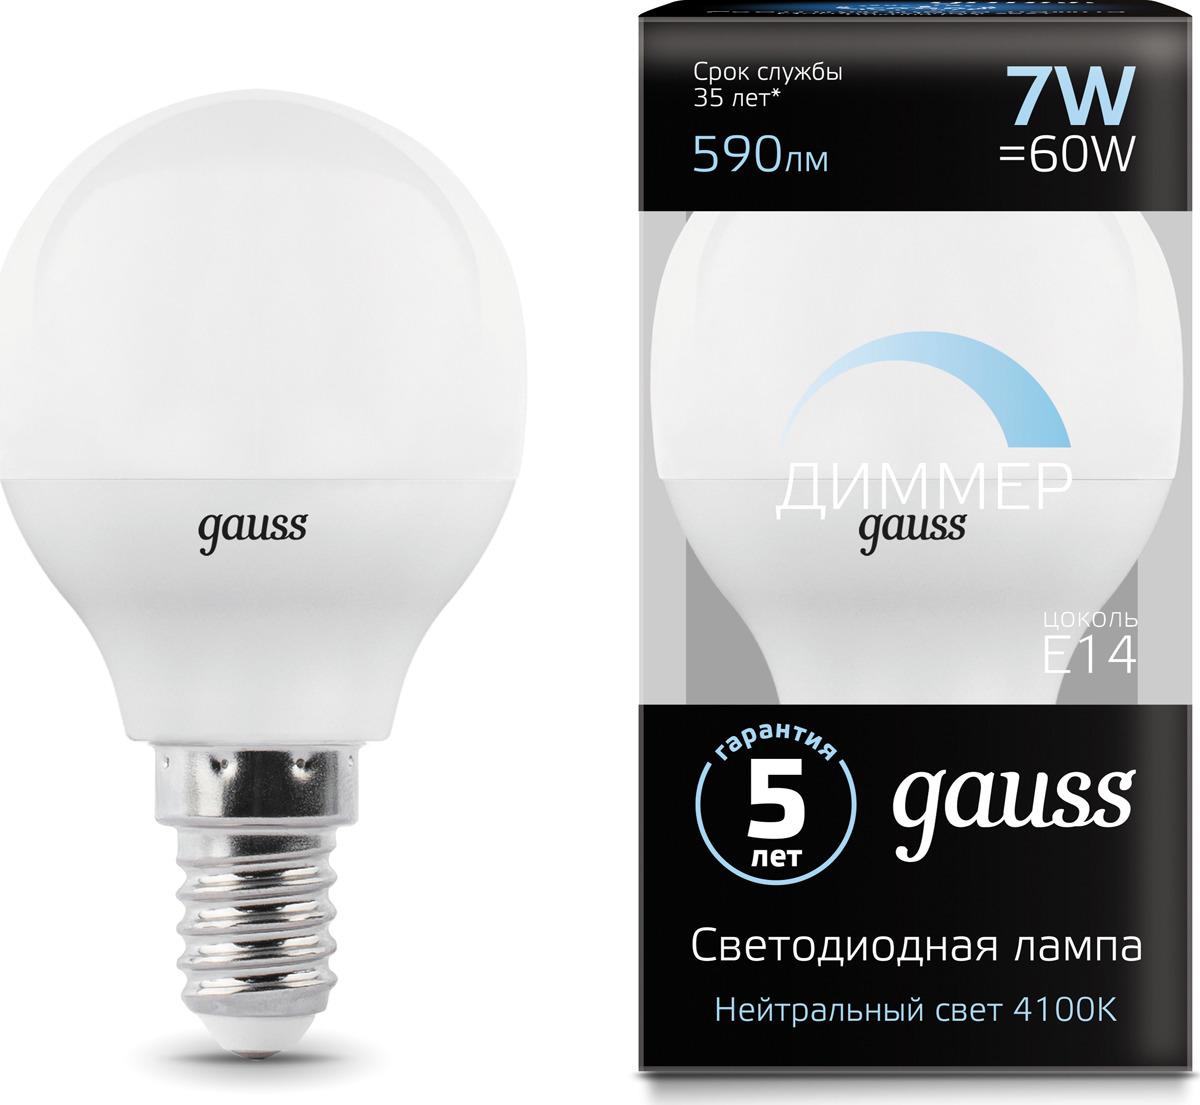 Лампочка Gauss Black LED, шар, E14, 7W. 105101207-D лампочка gauss gs 105801205